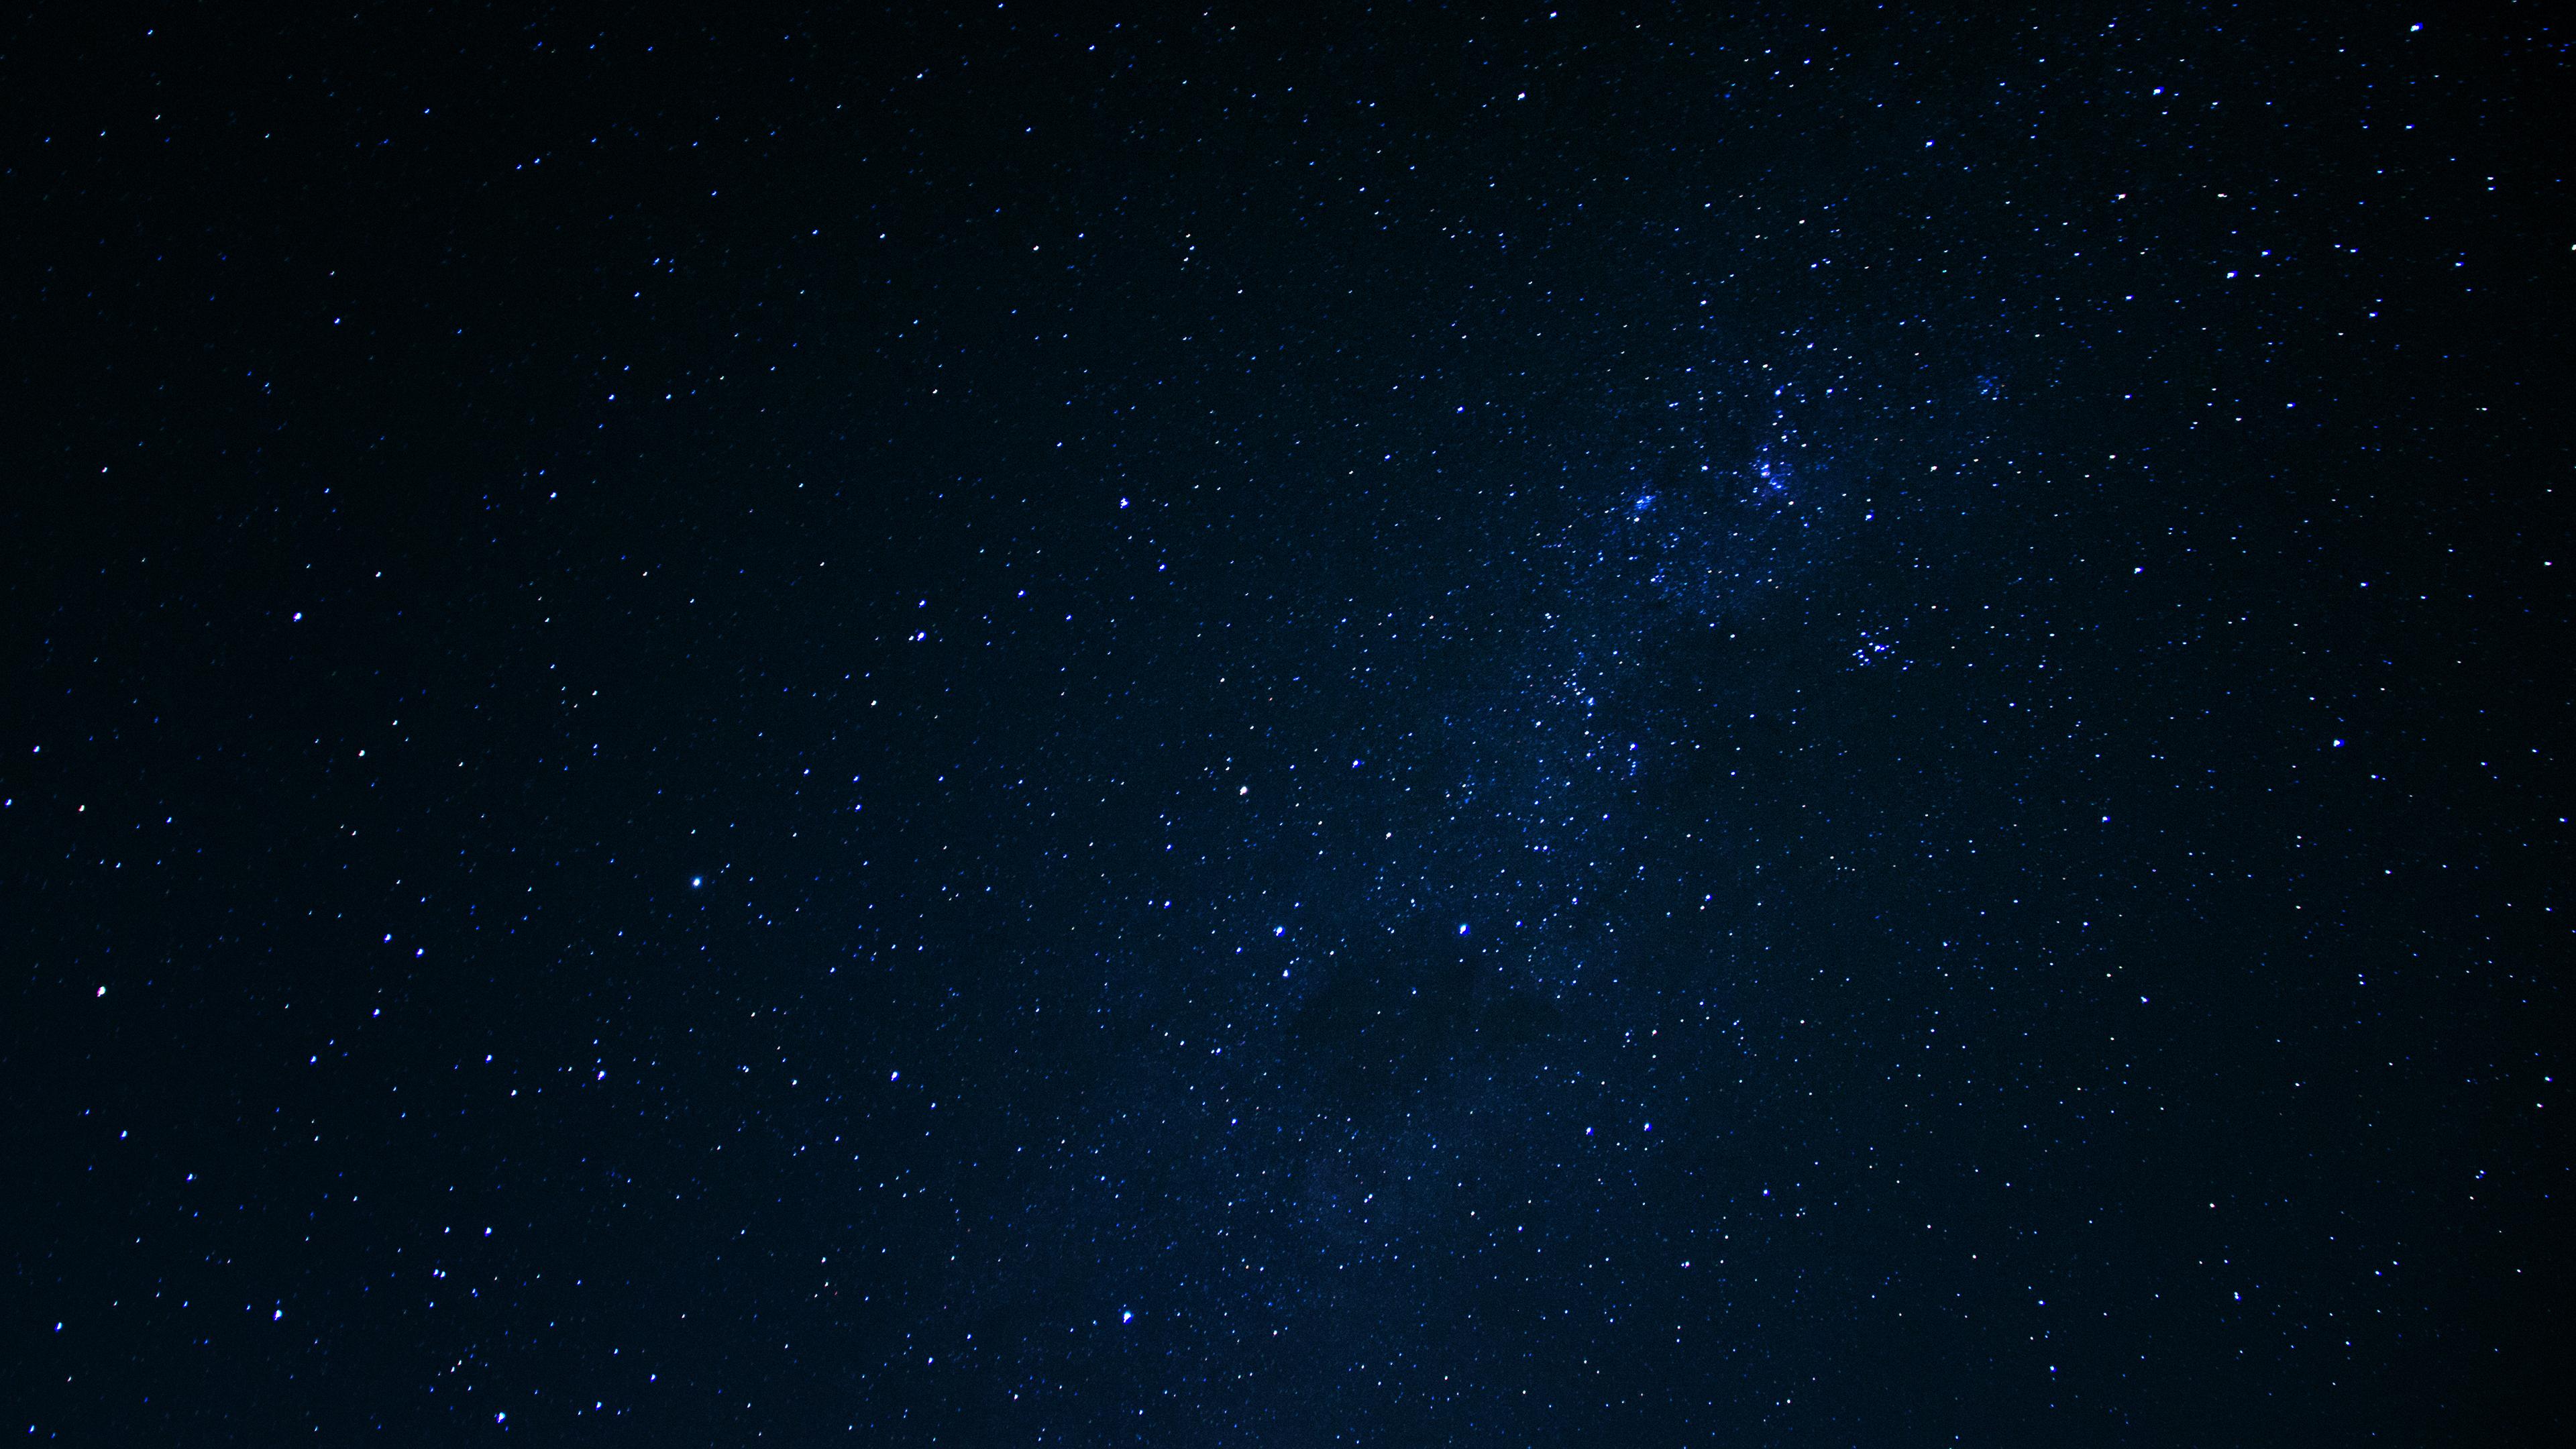 Estrellas 4k Ultra Fondo De Pantalla HD